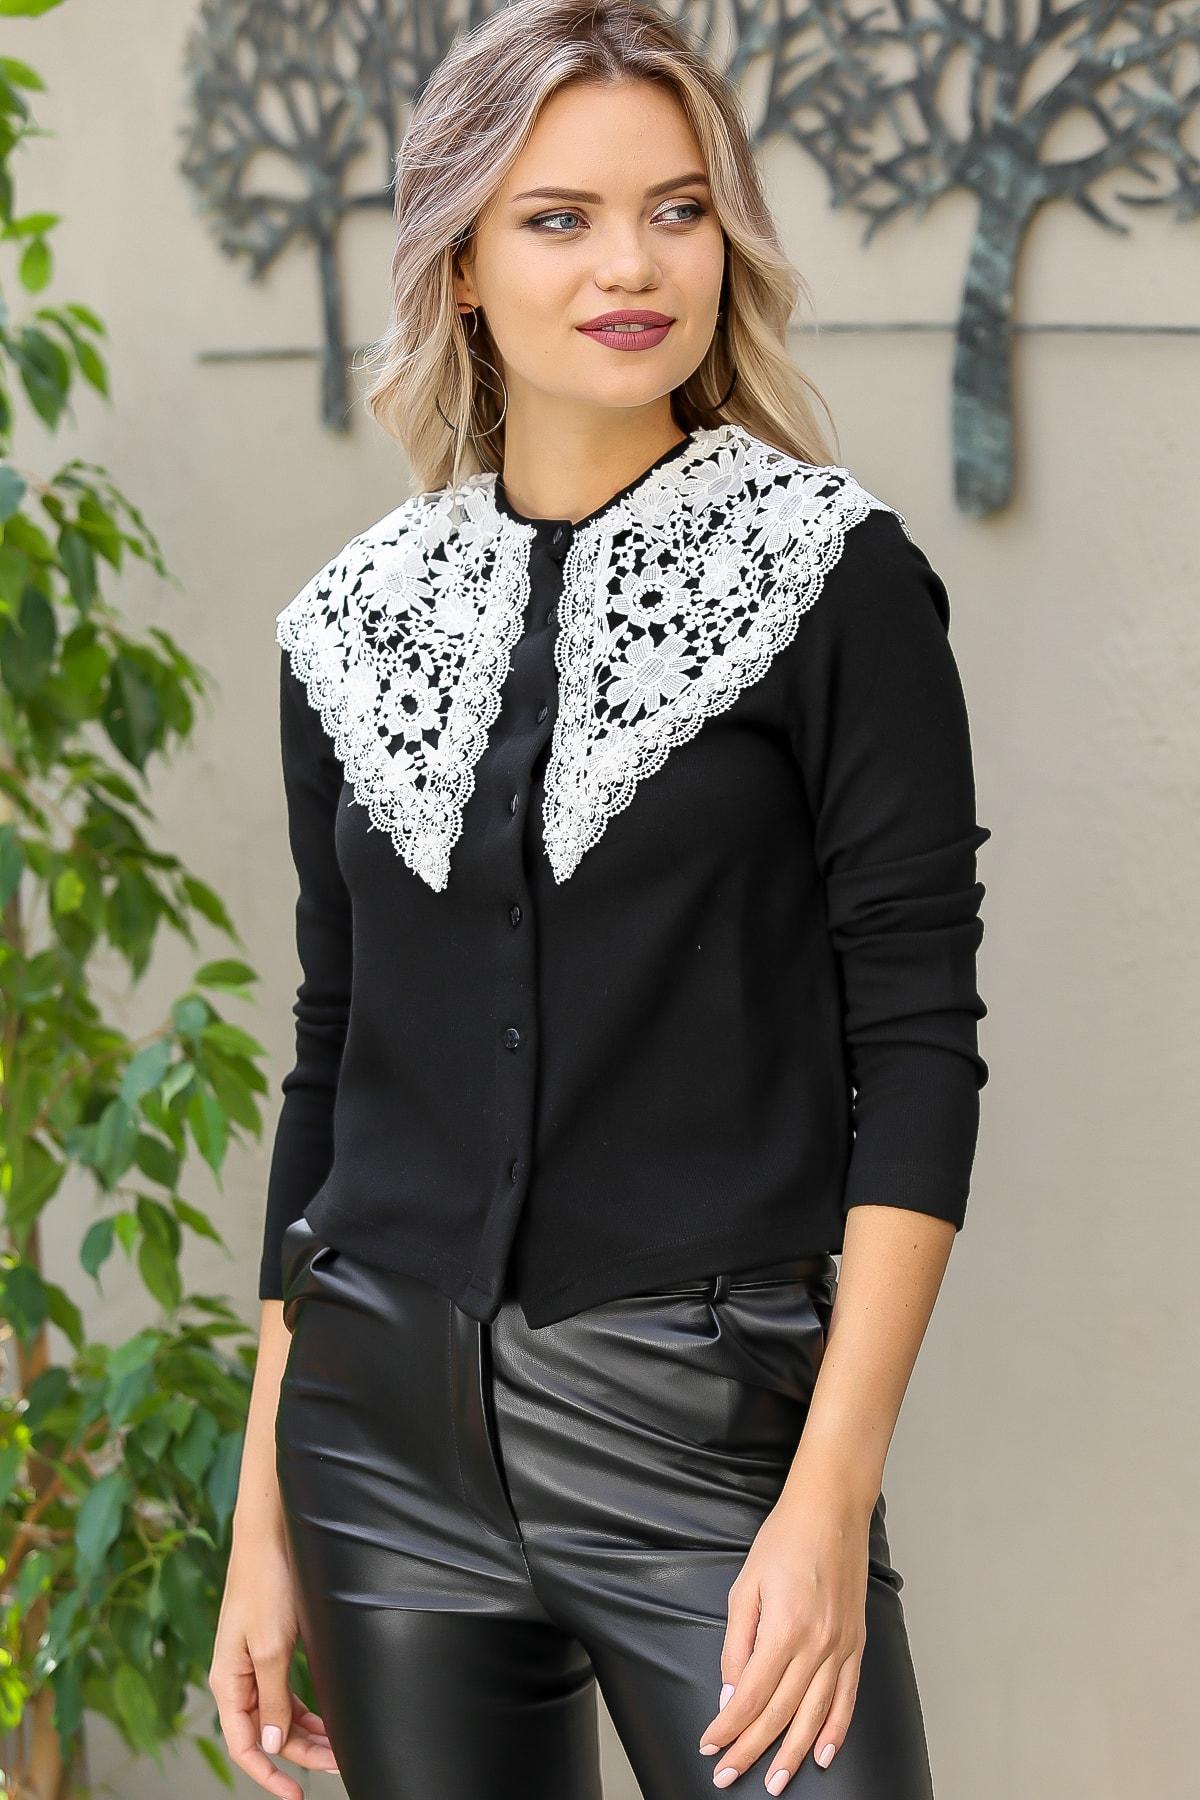 Chiccy Kadın Siyah Vintage Dev Dantel Yakalı Düğme Detaylı Bluz